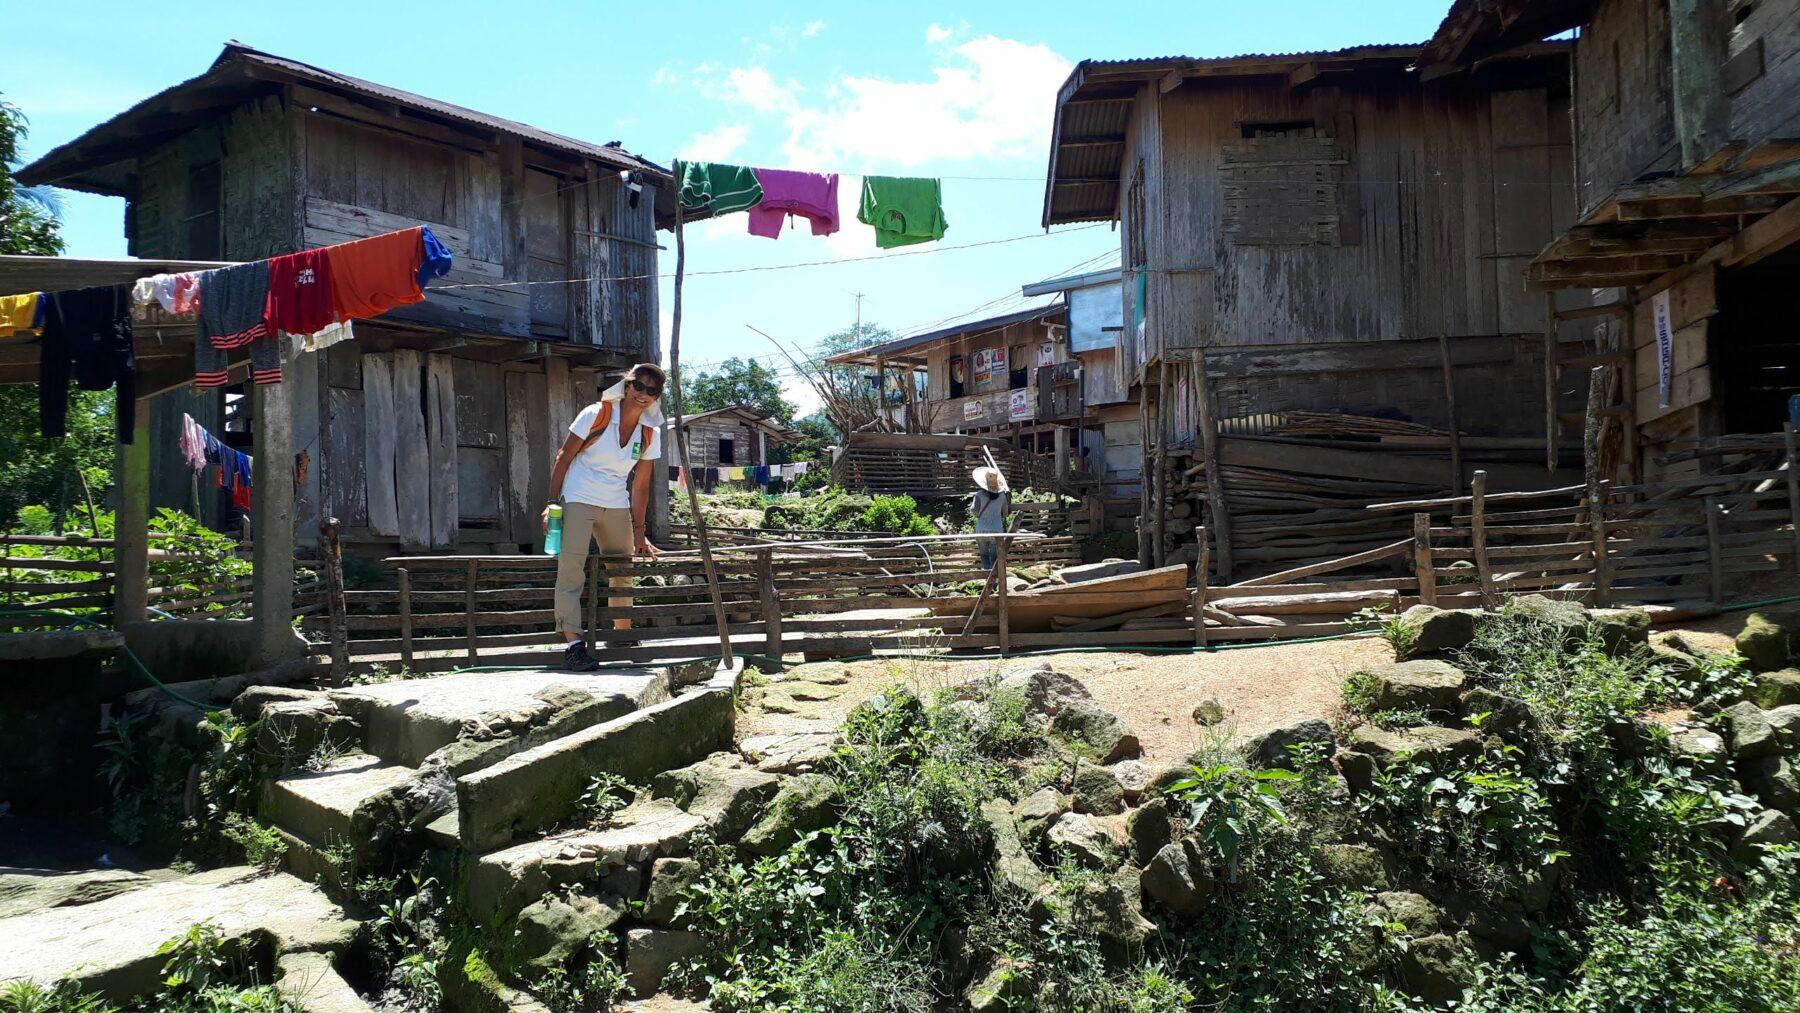 Hütten Luzon